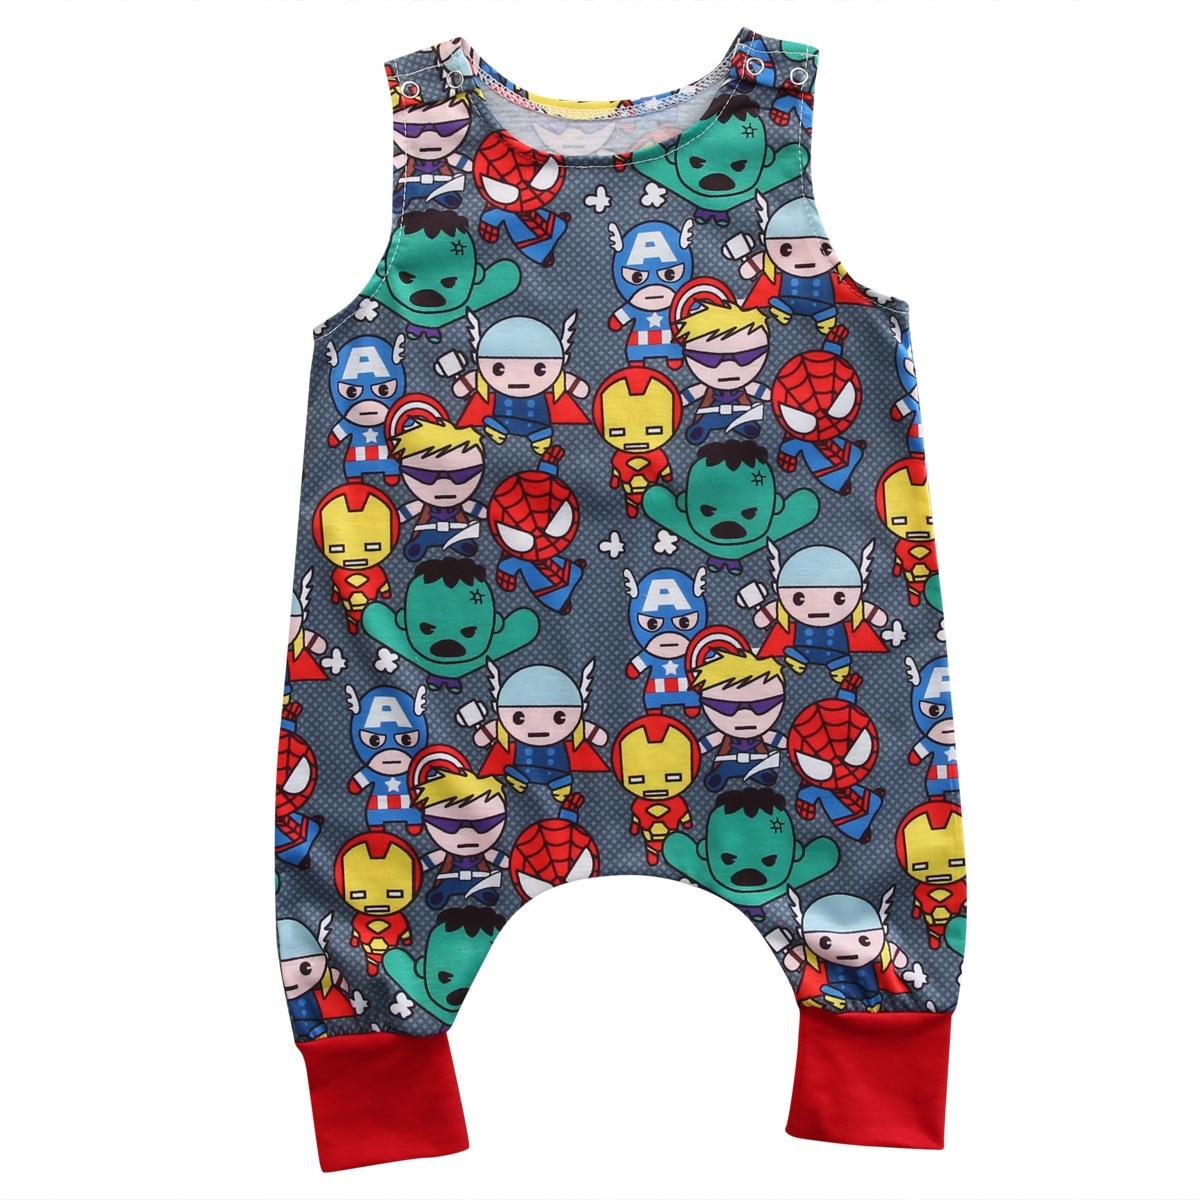 Pudcoco Infant Romper Jumpsuit Summer Newborn Tank Romper Baby Clothes Cotton Super Heroes